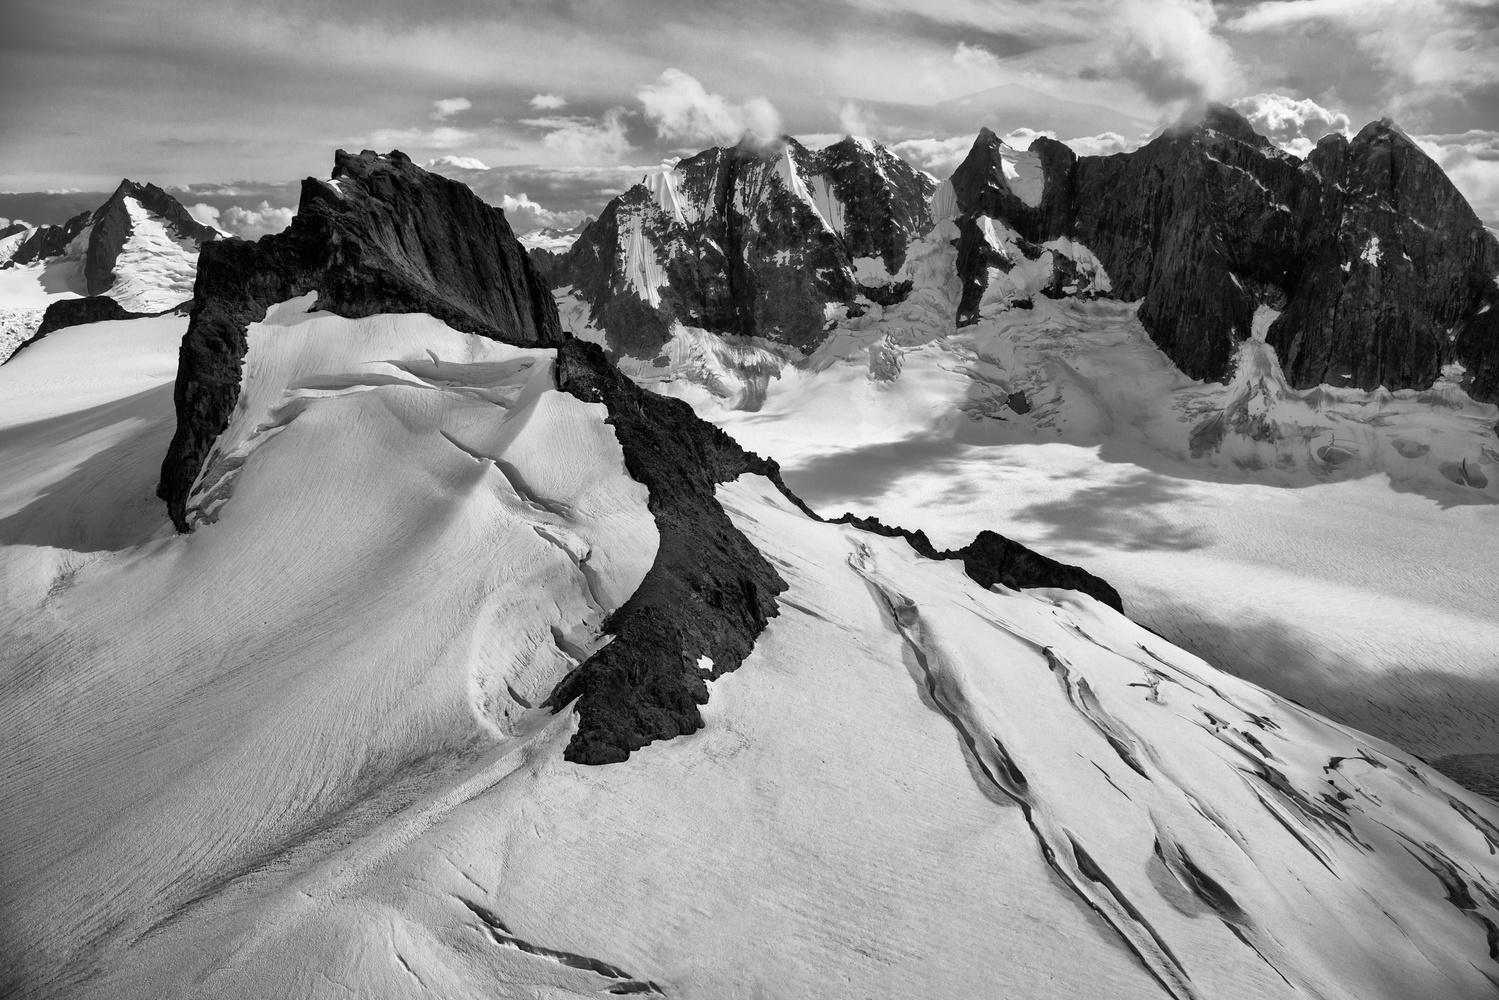 Above the Glaciers by Alex Coleman